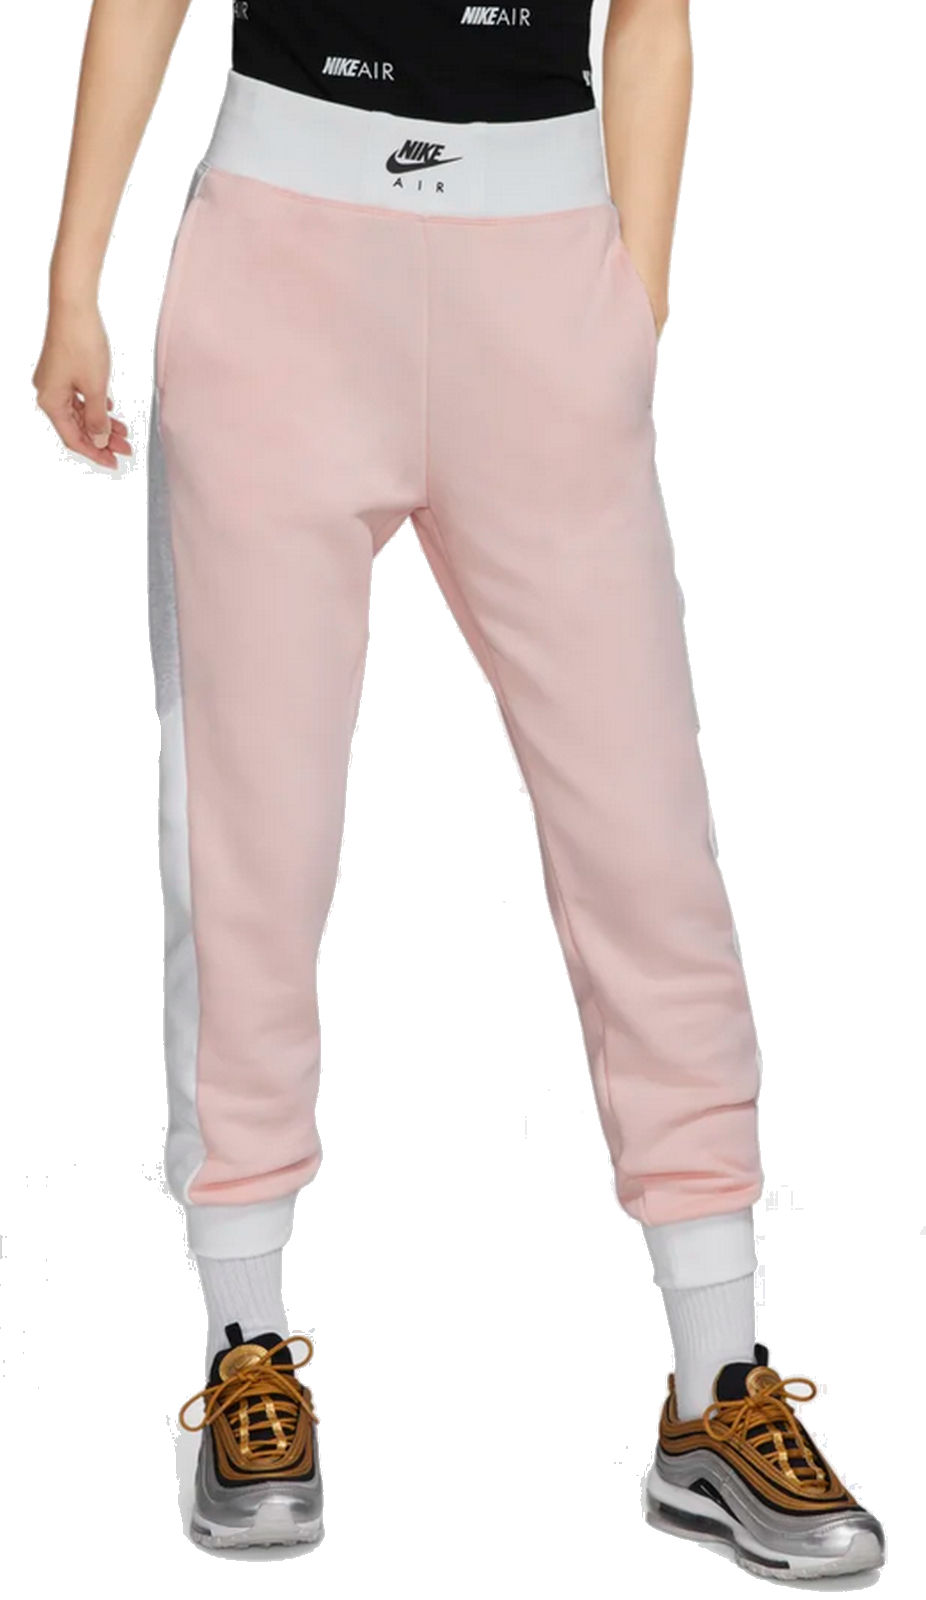 pantalon nike femme rose